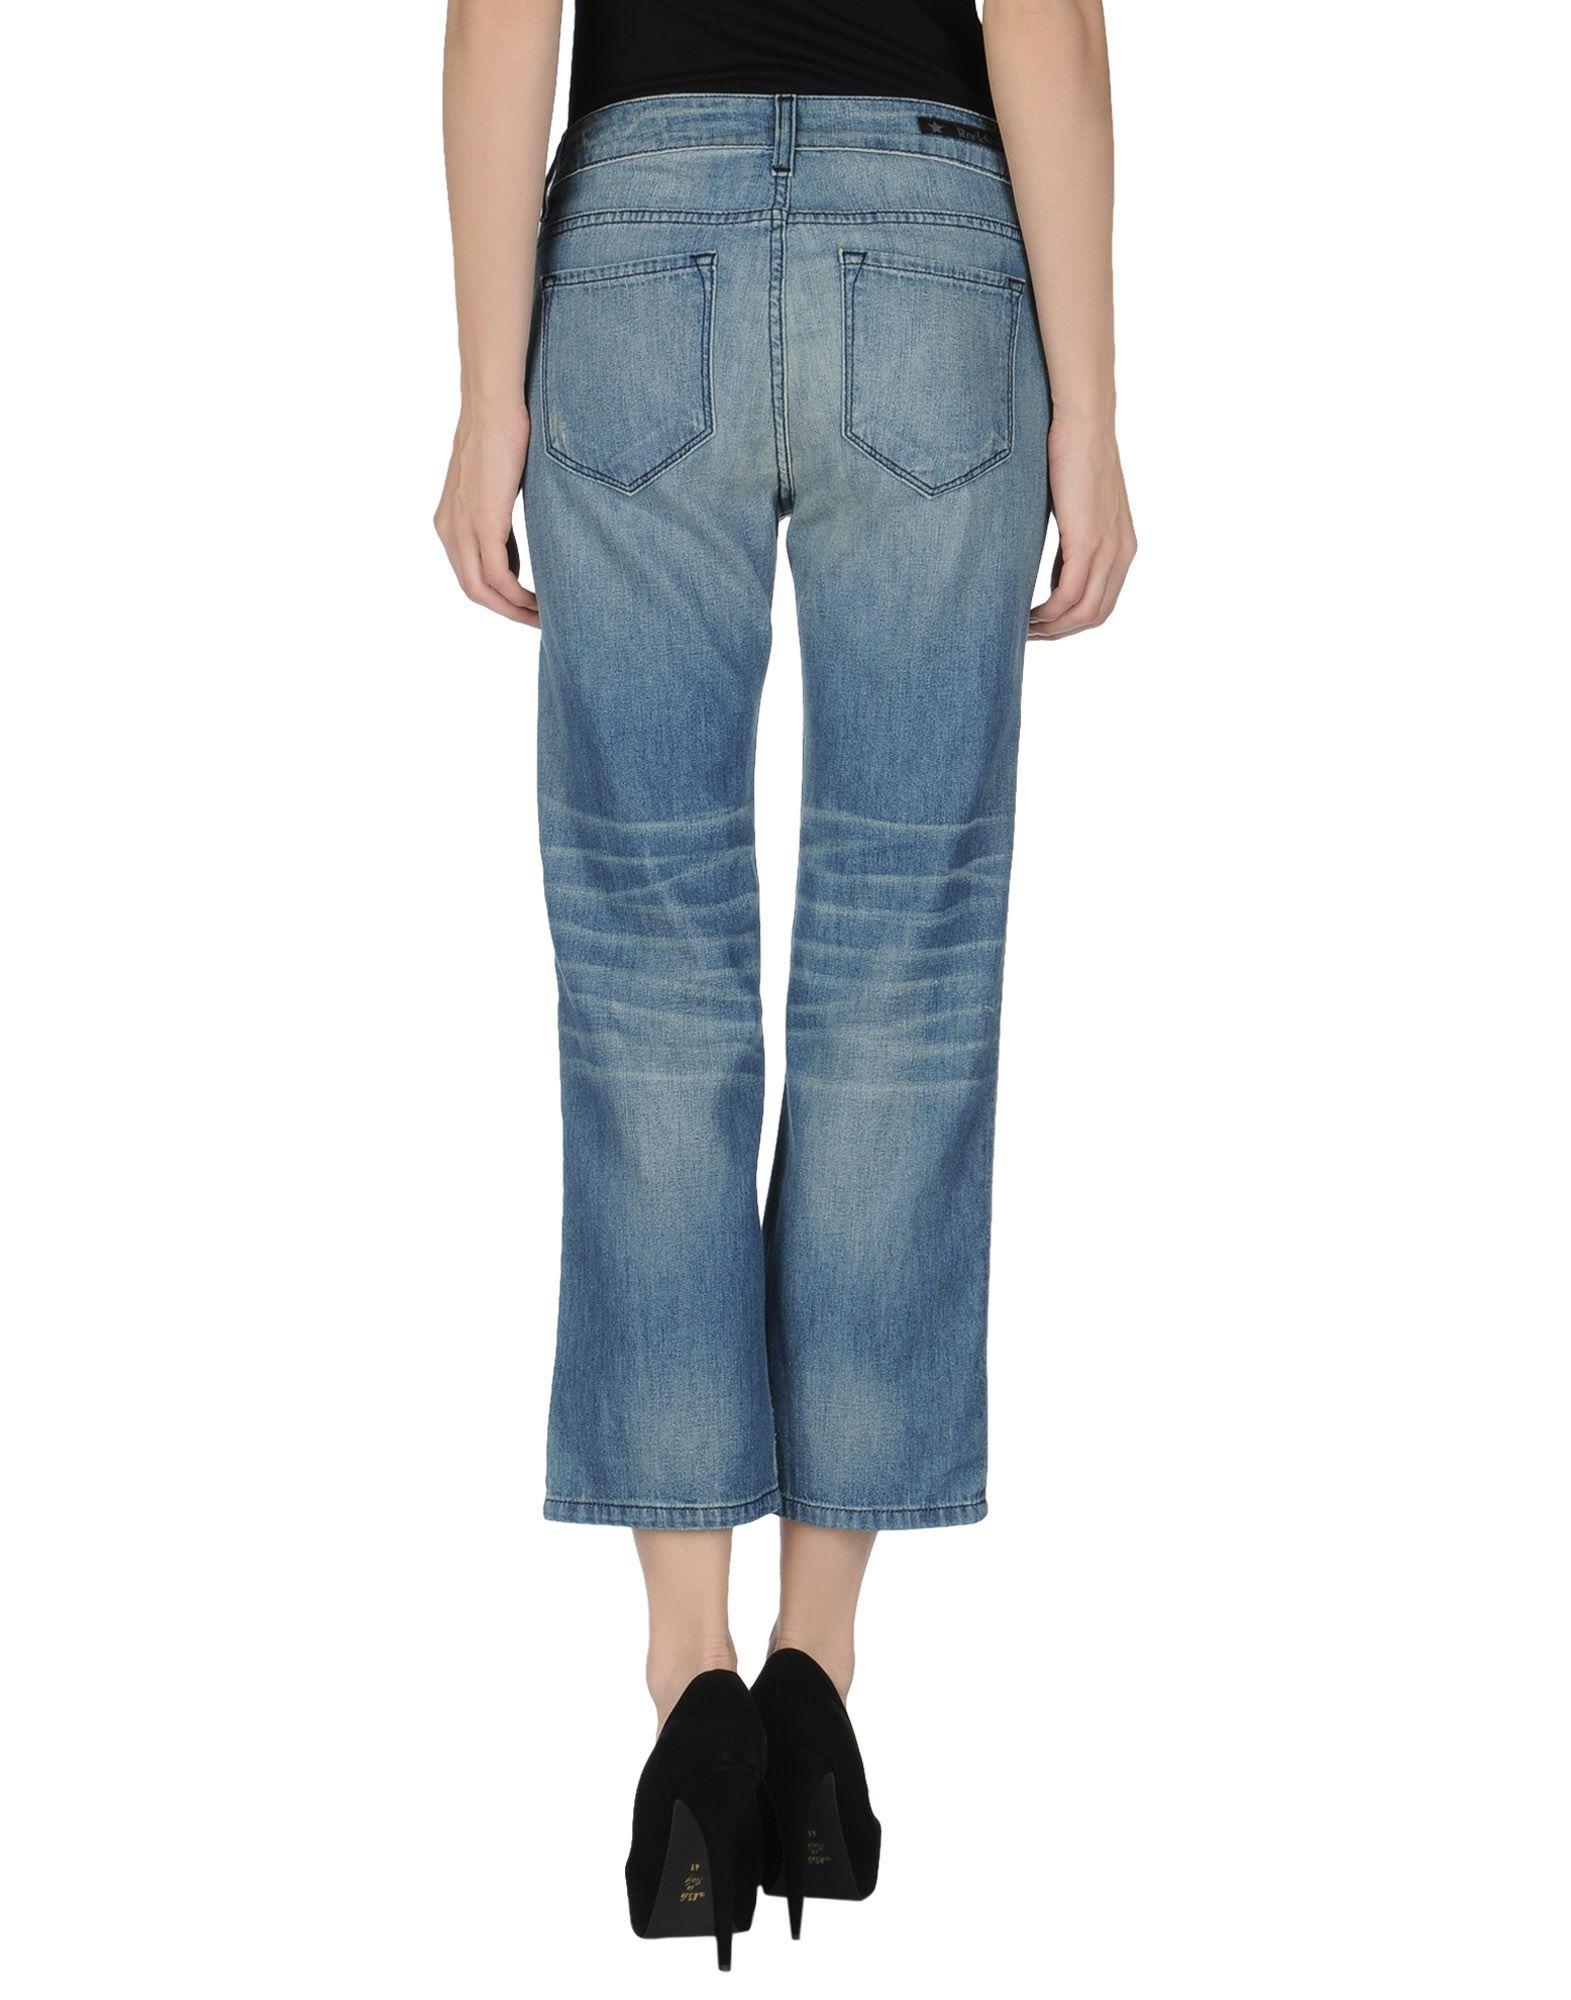 Lyst - Rockstar Denim Trousers in Blue